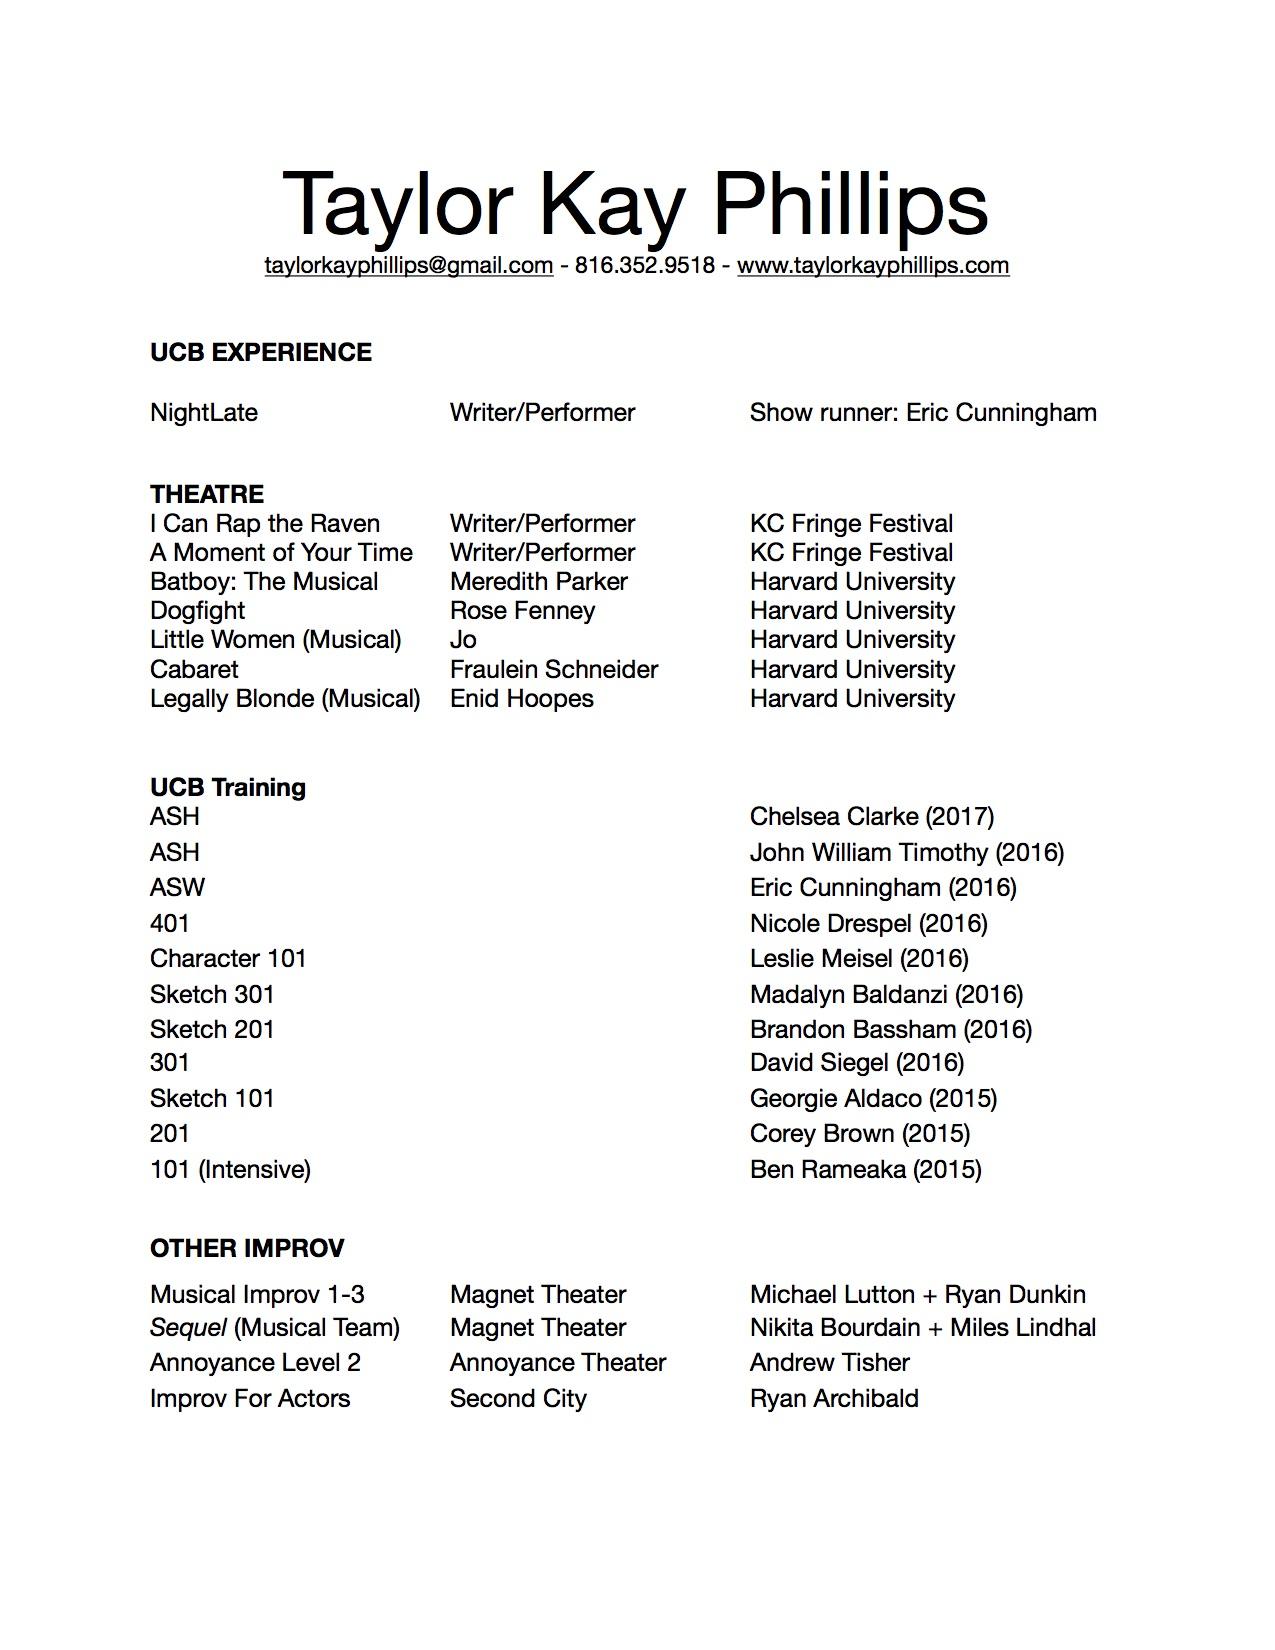 Theatre Resume Taylor Kay Phillips.jpg